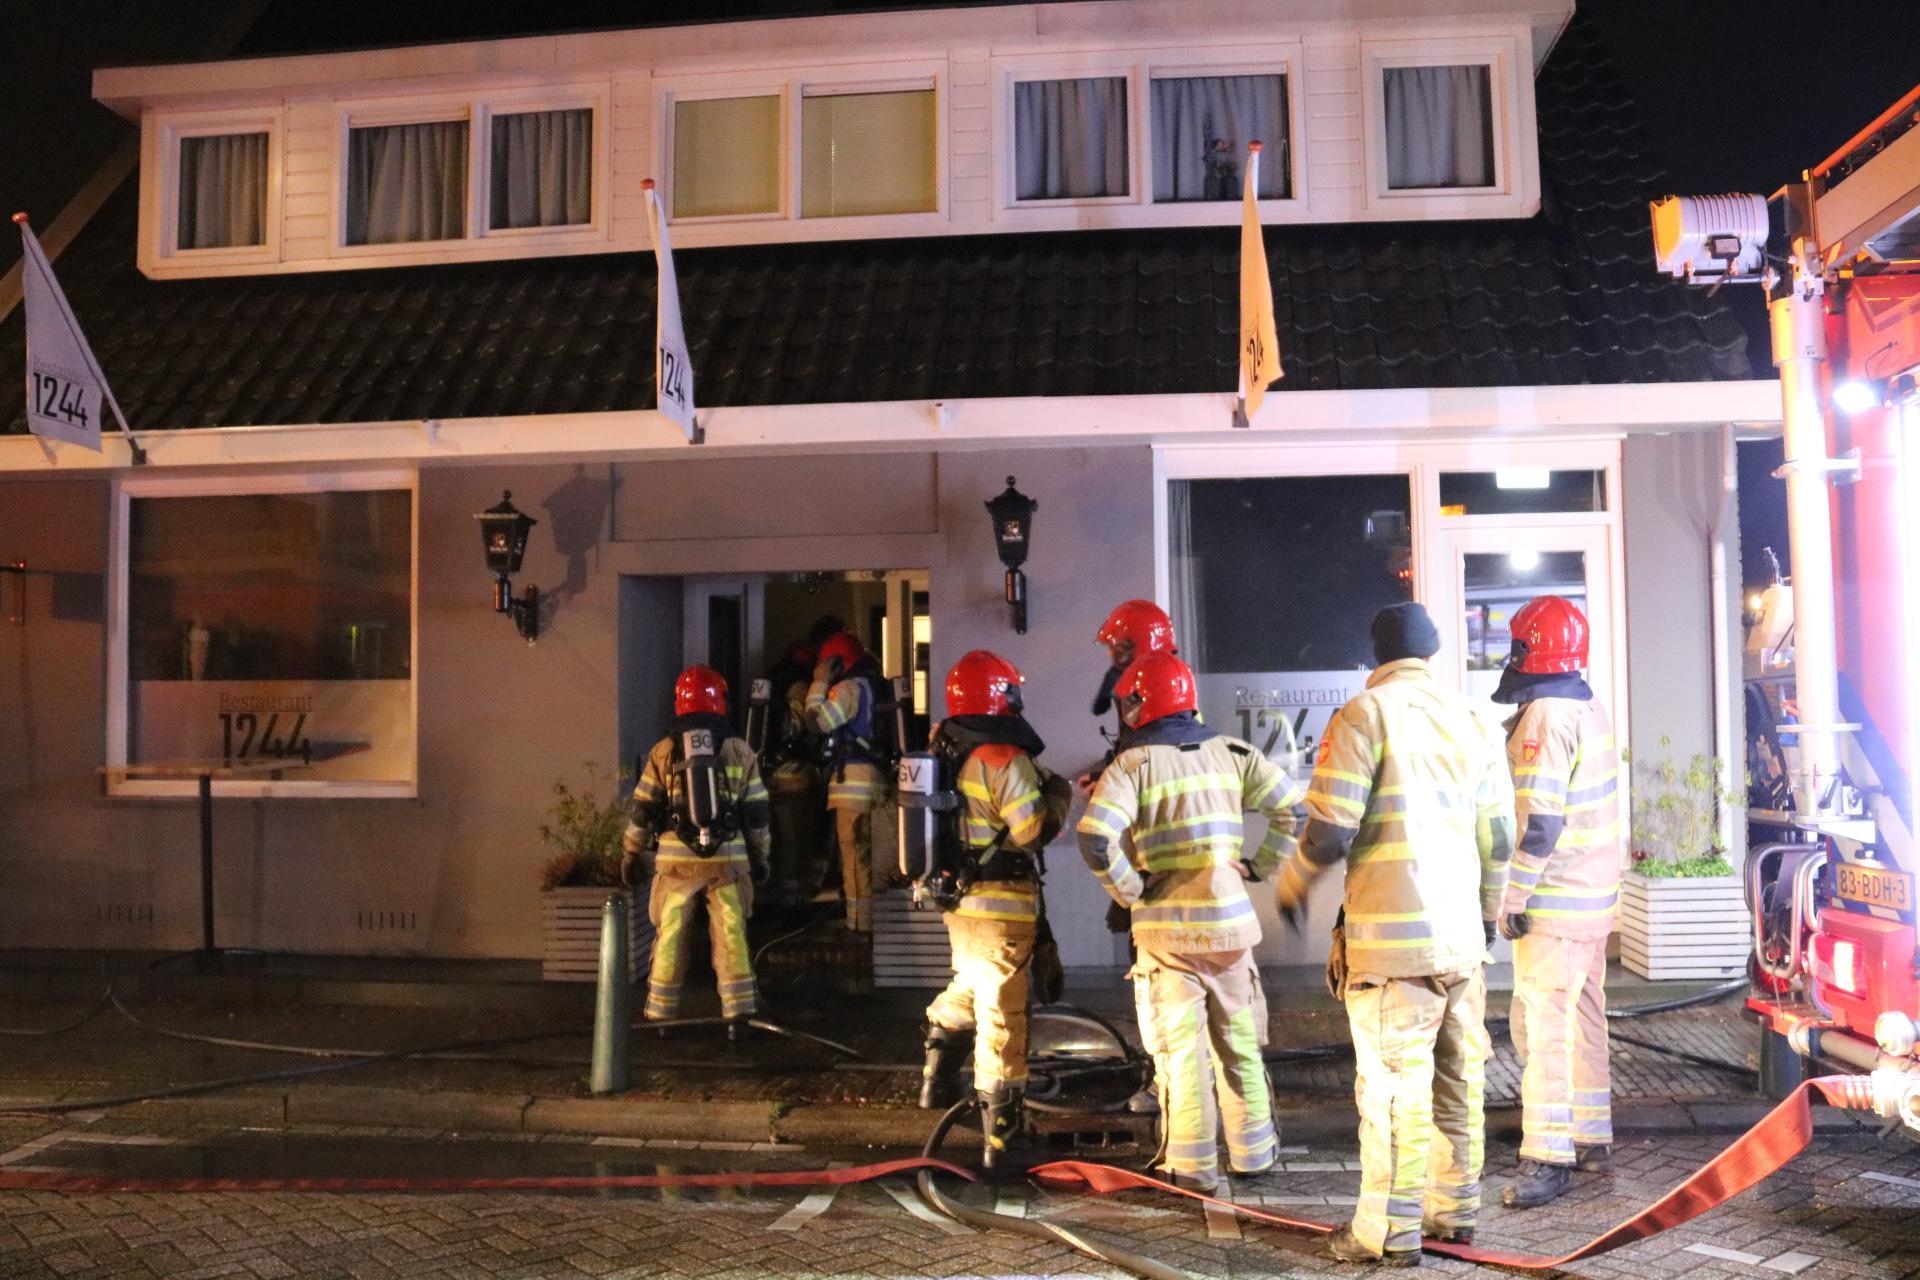 Half Ankeveen helpt Restaurant 1244 dat na uitslaande brand in achterliggende schuur toch helemaal gestript moet